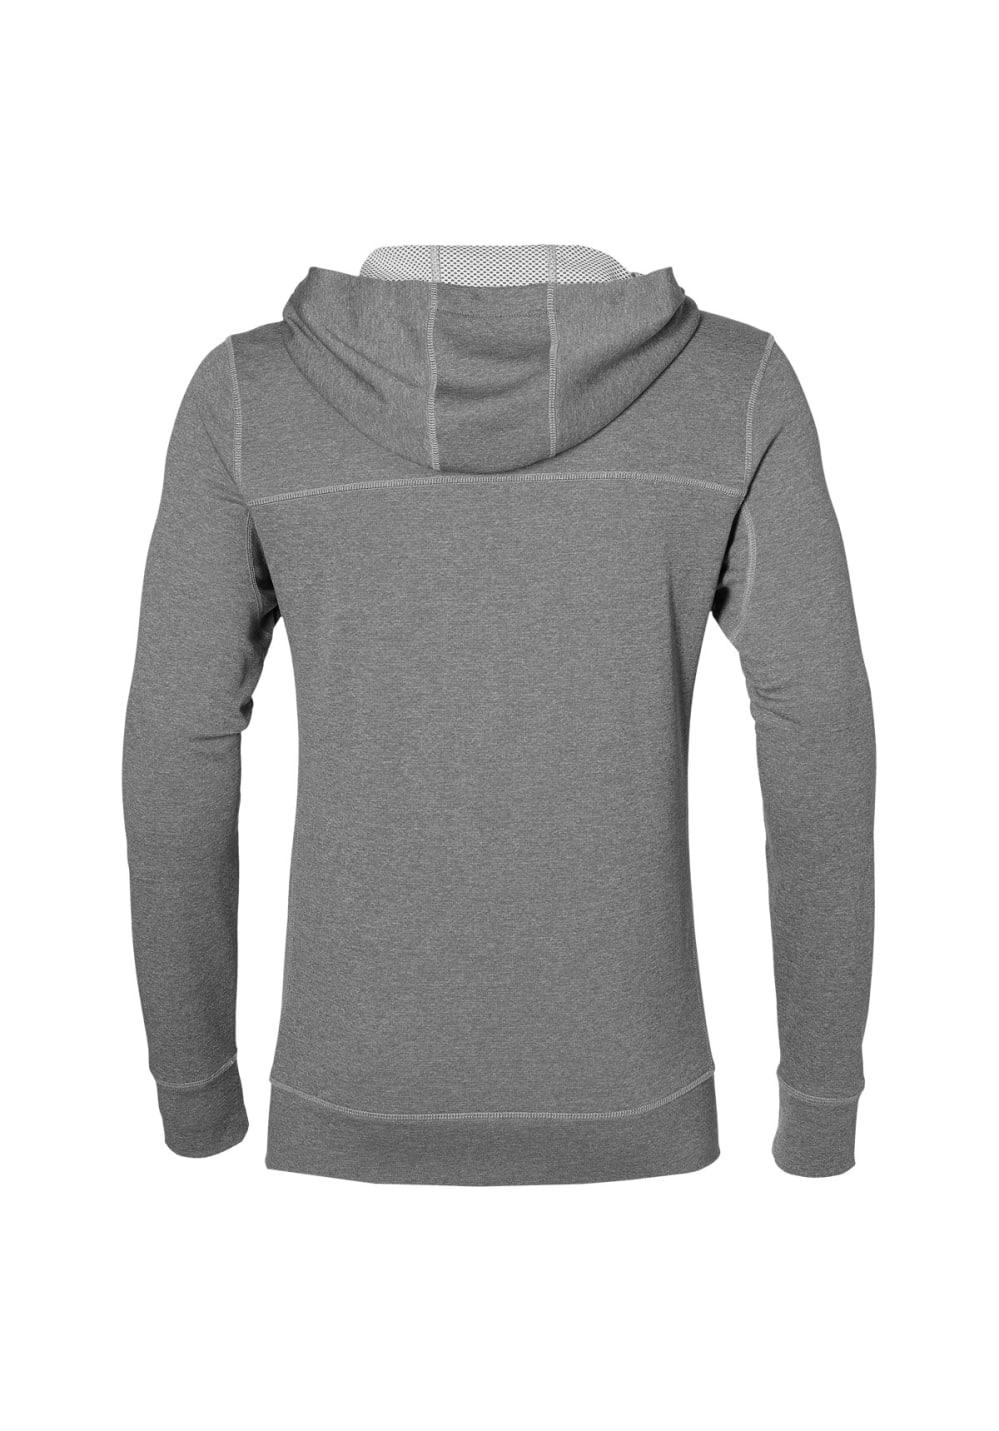 d365fdb3 ASICS Tech Fz Hoody - Sweatshirts / Hoodies for Men - Grey